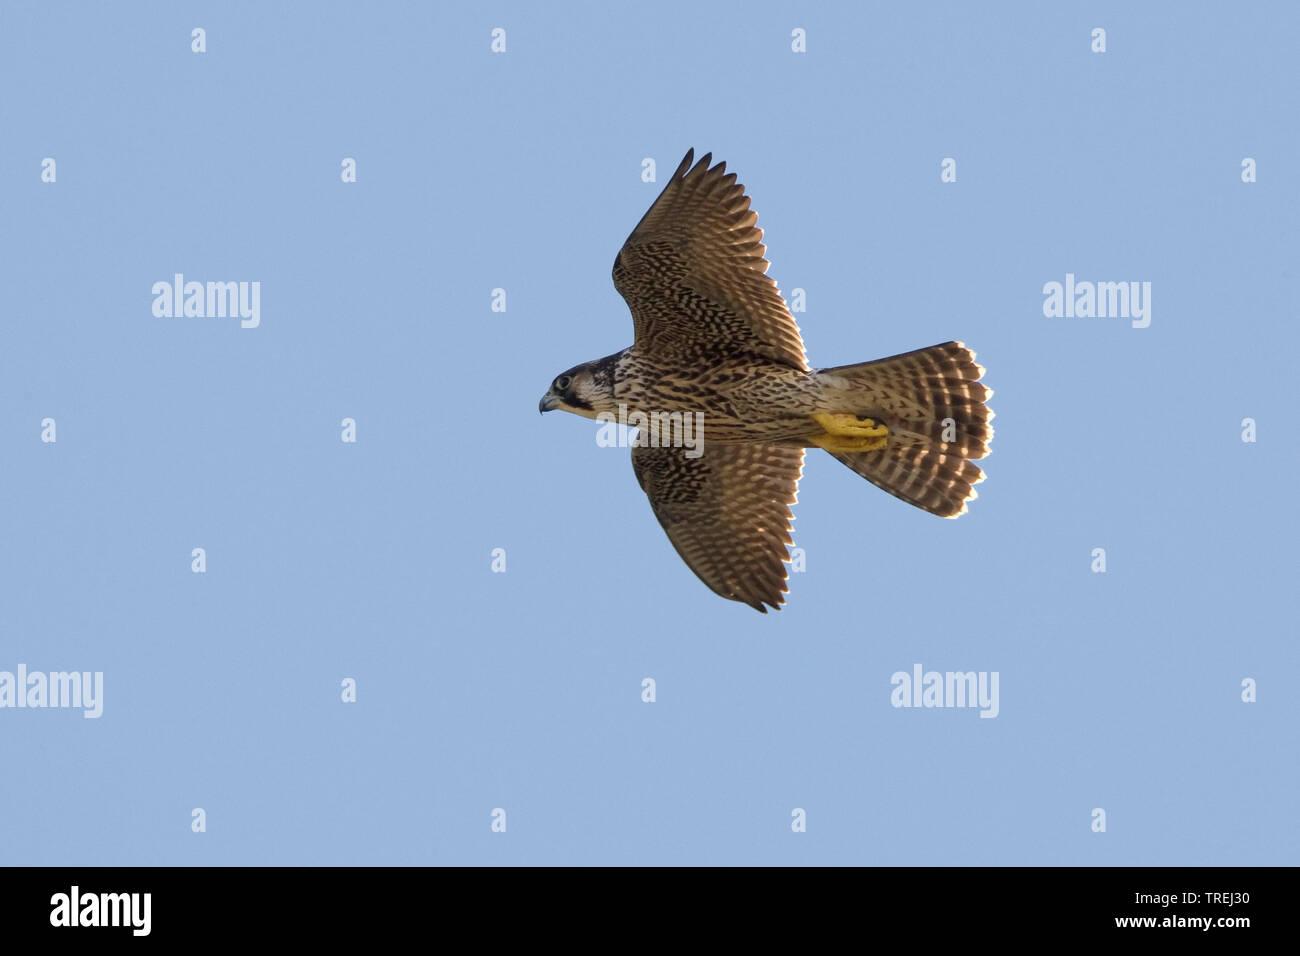 Wanderfalke, Wander-Falke (Falco peregrinus), im Flug, Italien   peregrine falcon (Falco peregrinus), in flight, Italy   BLWS527270.jpg [ (c) blickwin - Stock Image